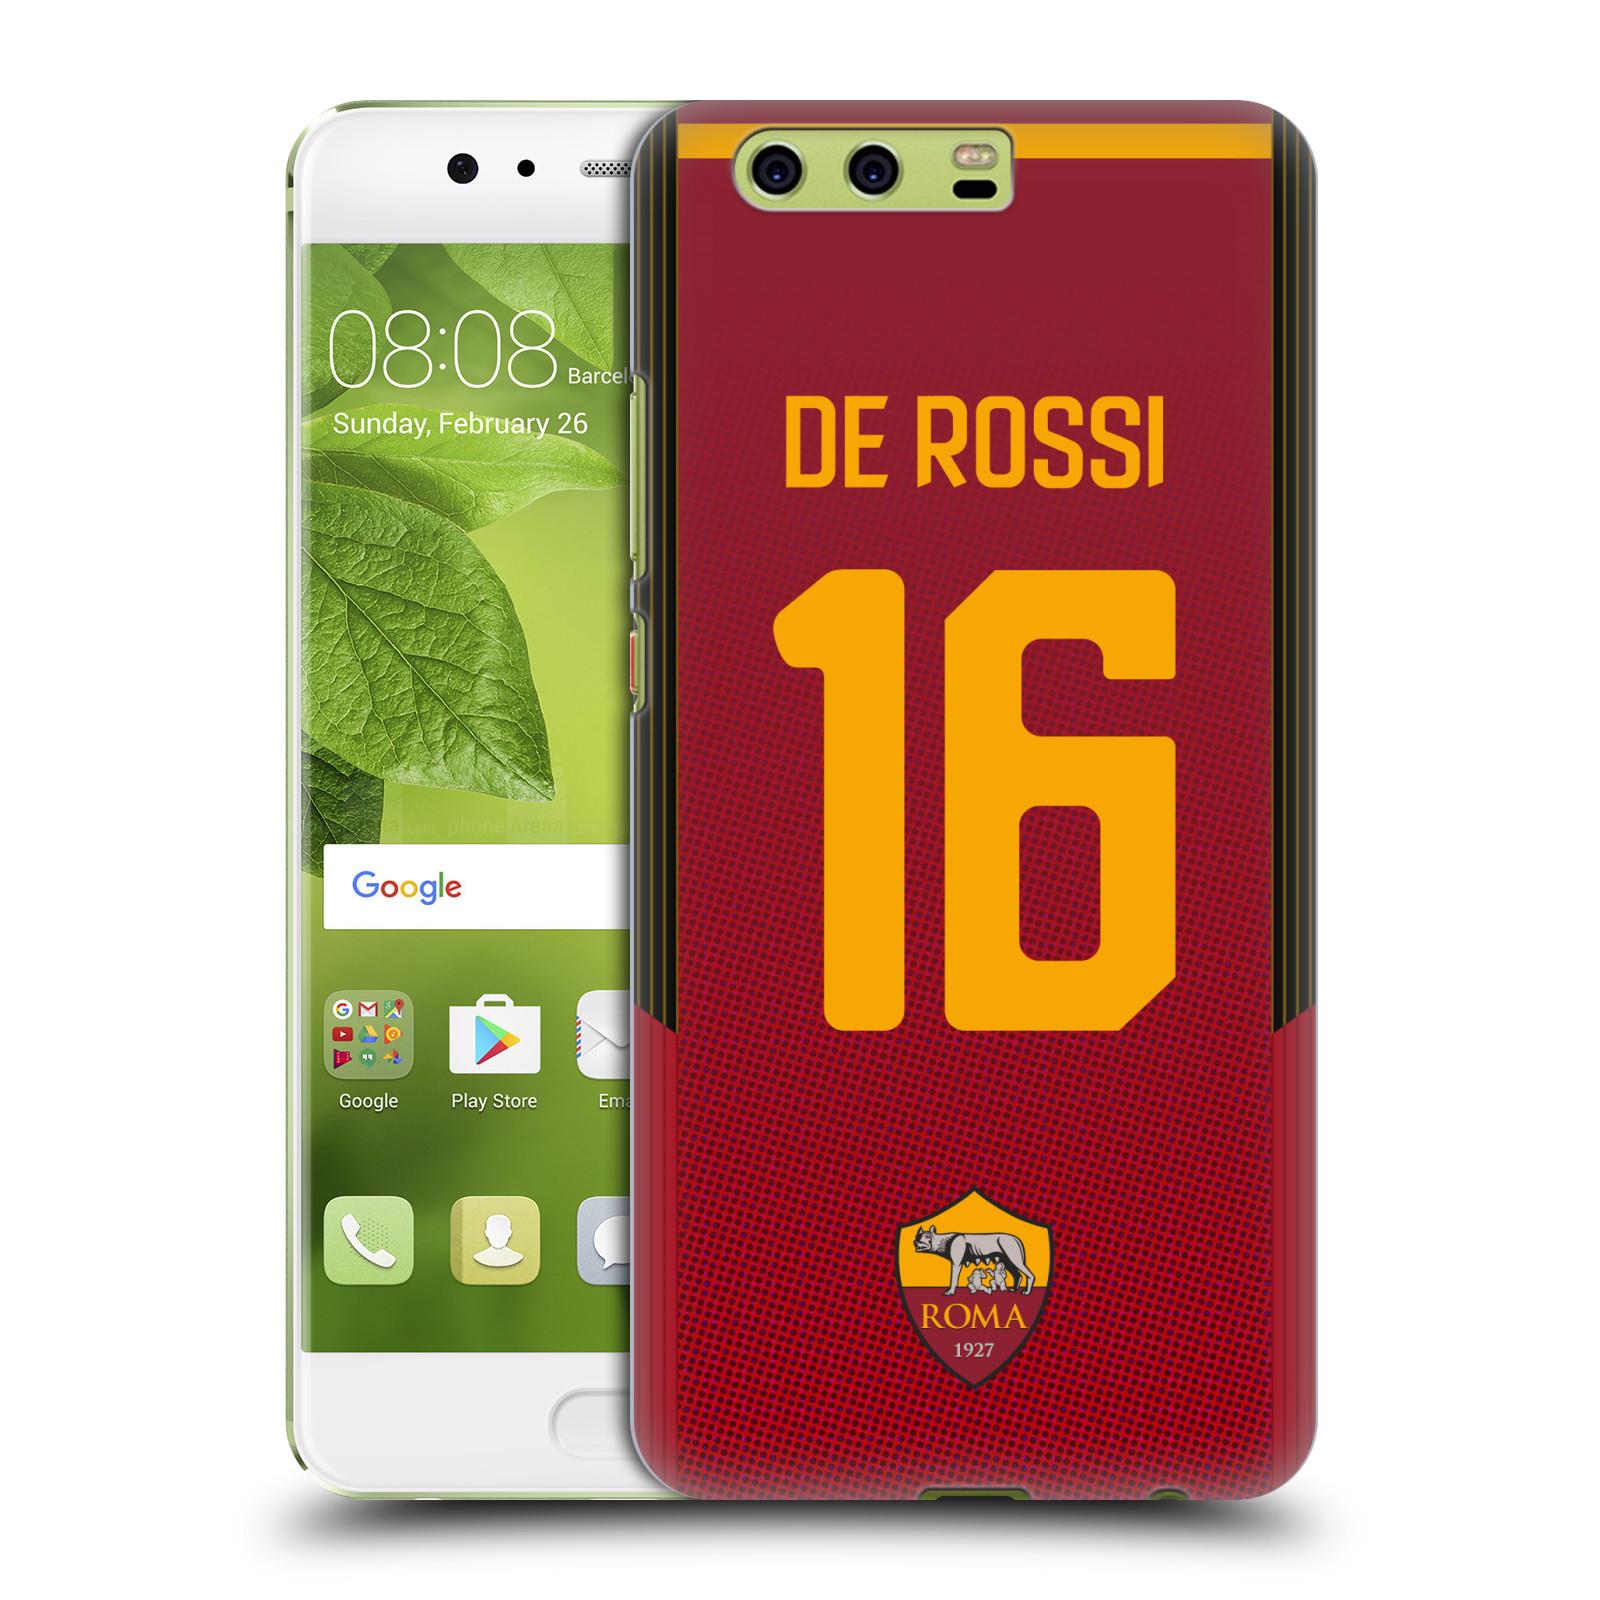 UFFICIALE-AS-ROMA-2017-18-GIOCATORI-KIT-IN-CASA-2-CASE-PER-HUAWEI-TELEFONI-1